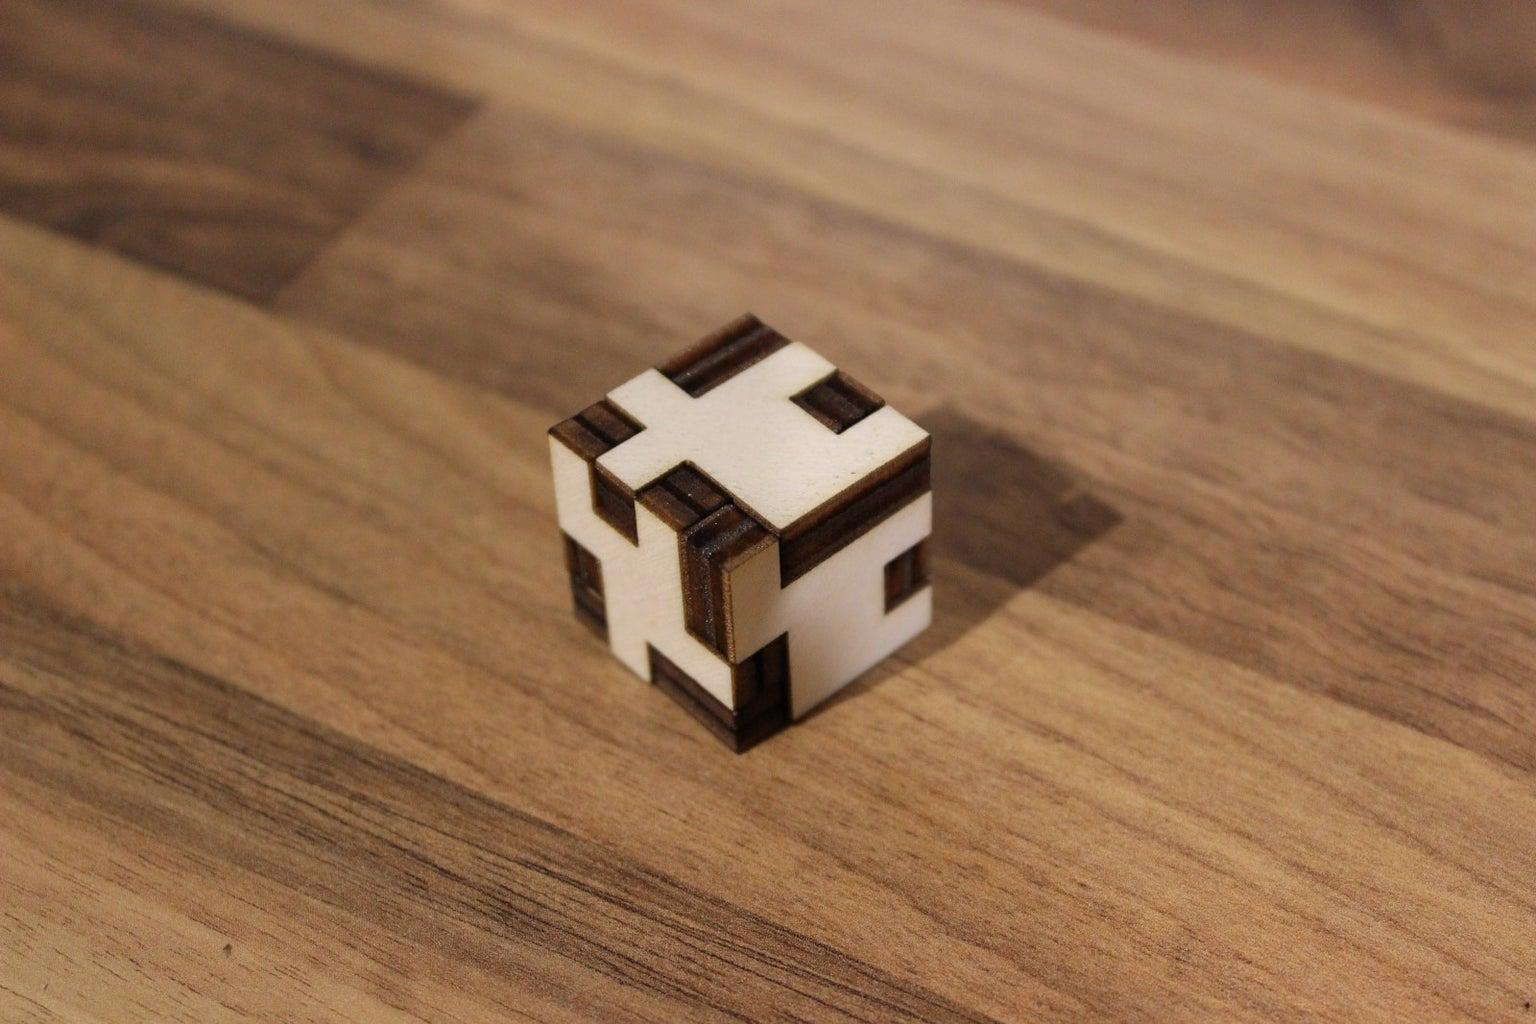 Cube Puzzles